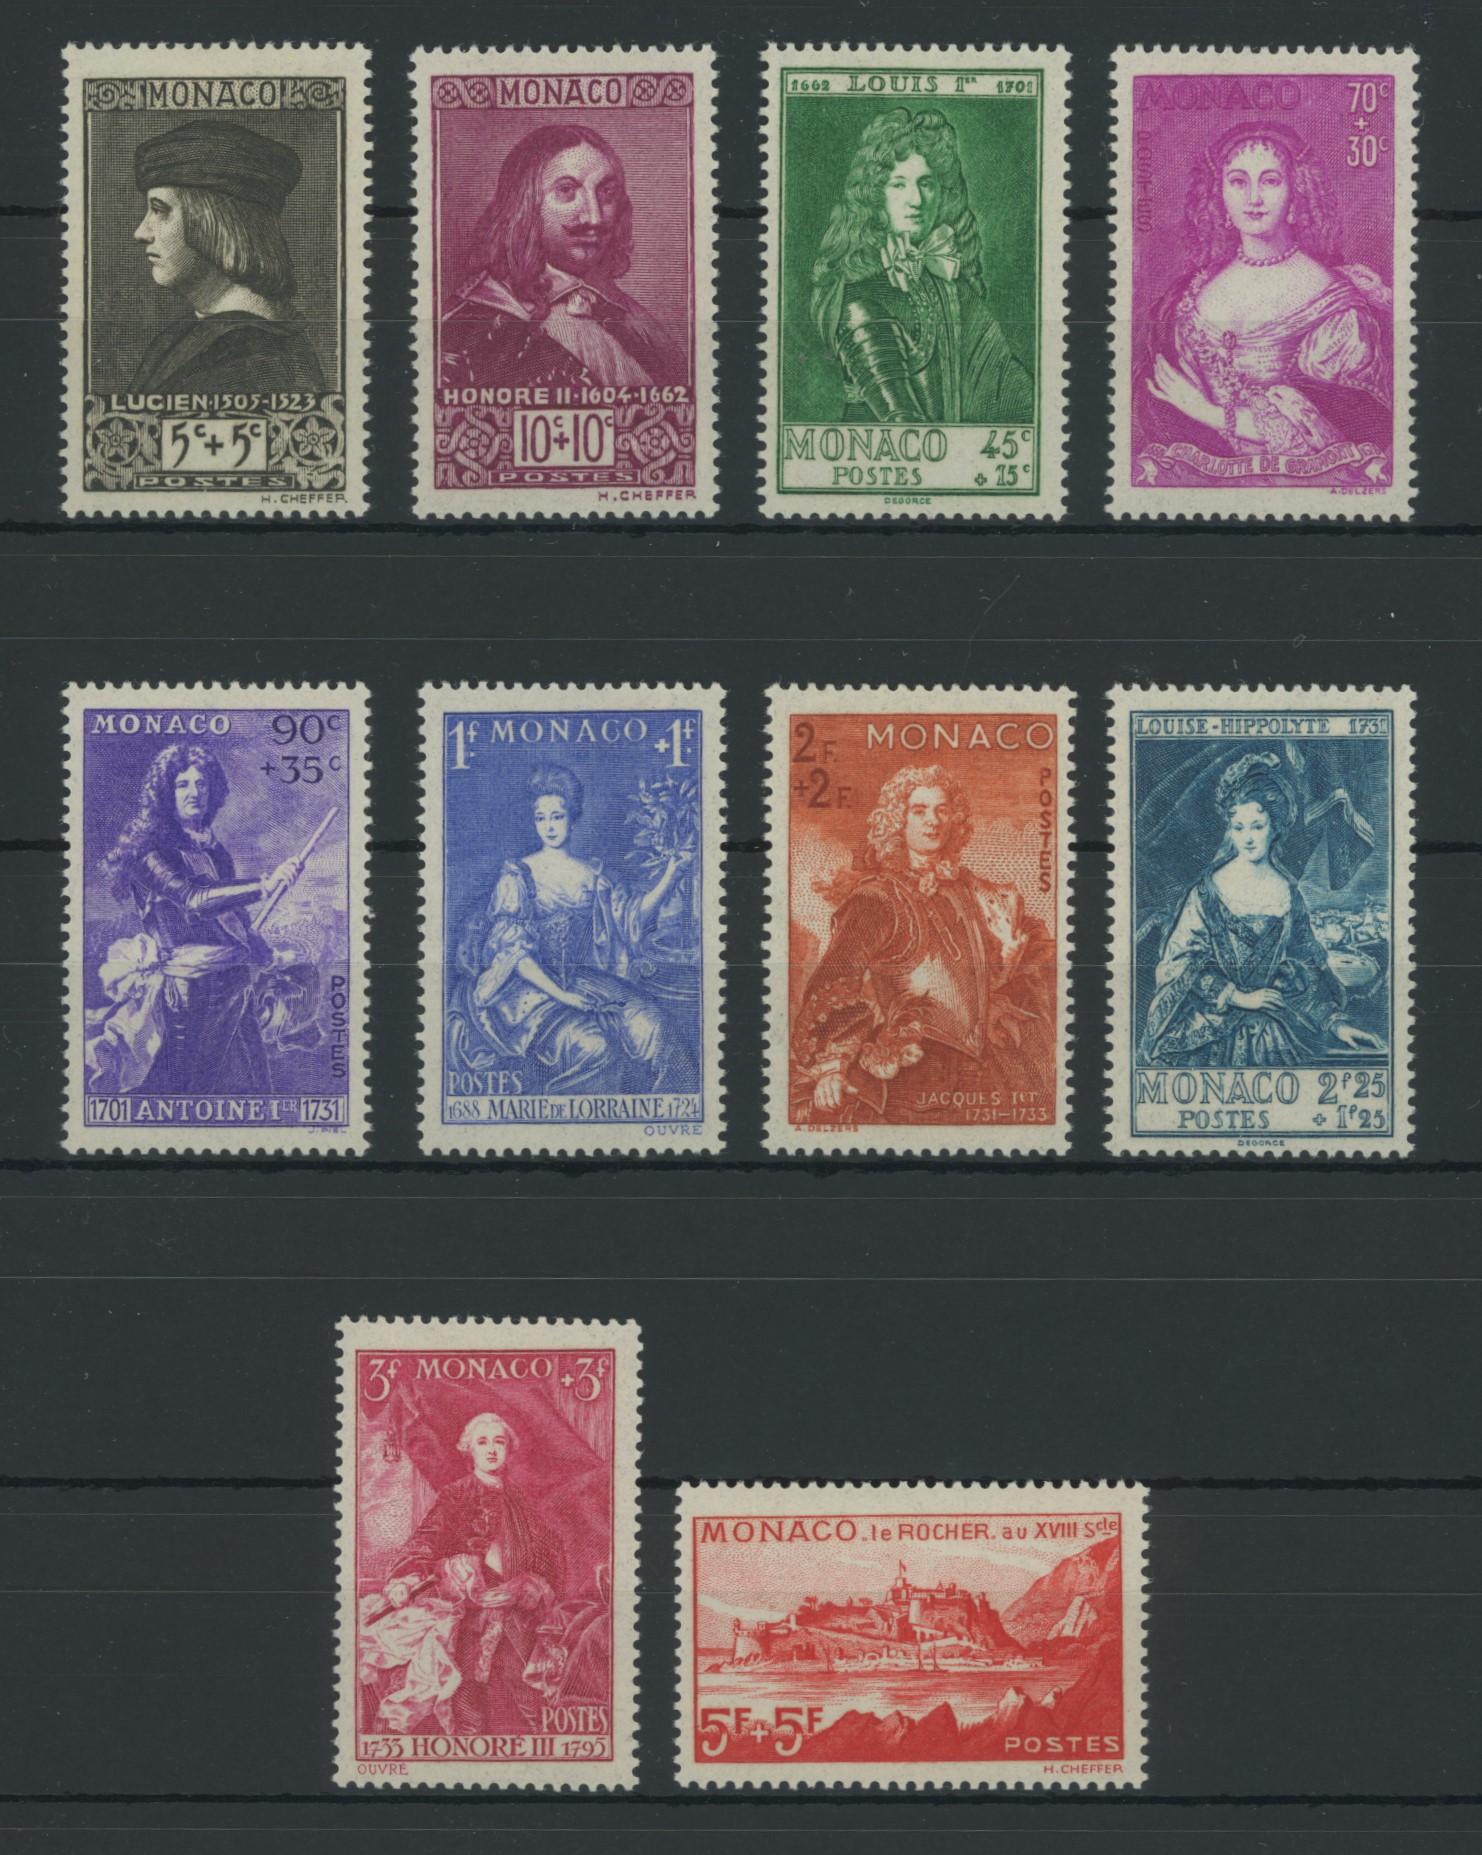 Lot 2350 - Monaco (Michel)  -  Skanfil Auksjoner AS  Public auction 211